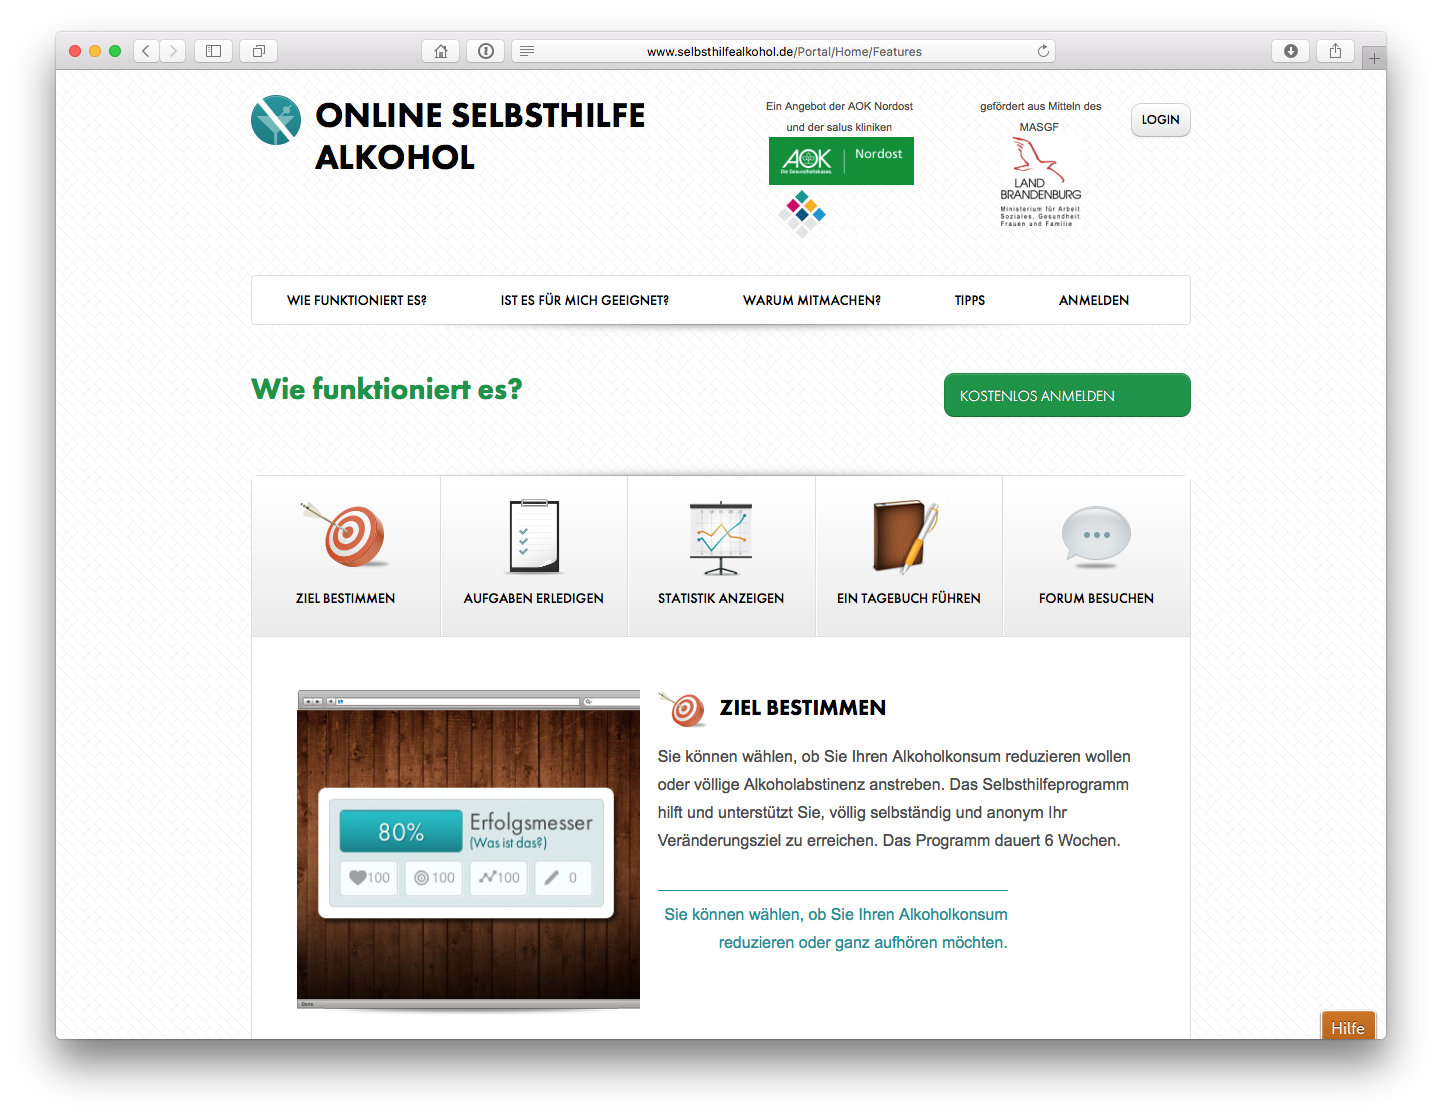 Screenshot von http://www.selbsthilfealkohol.de